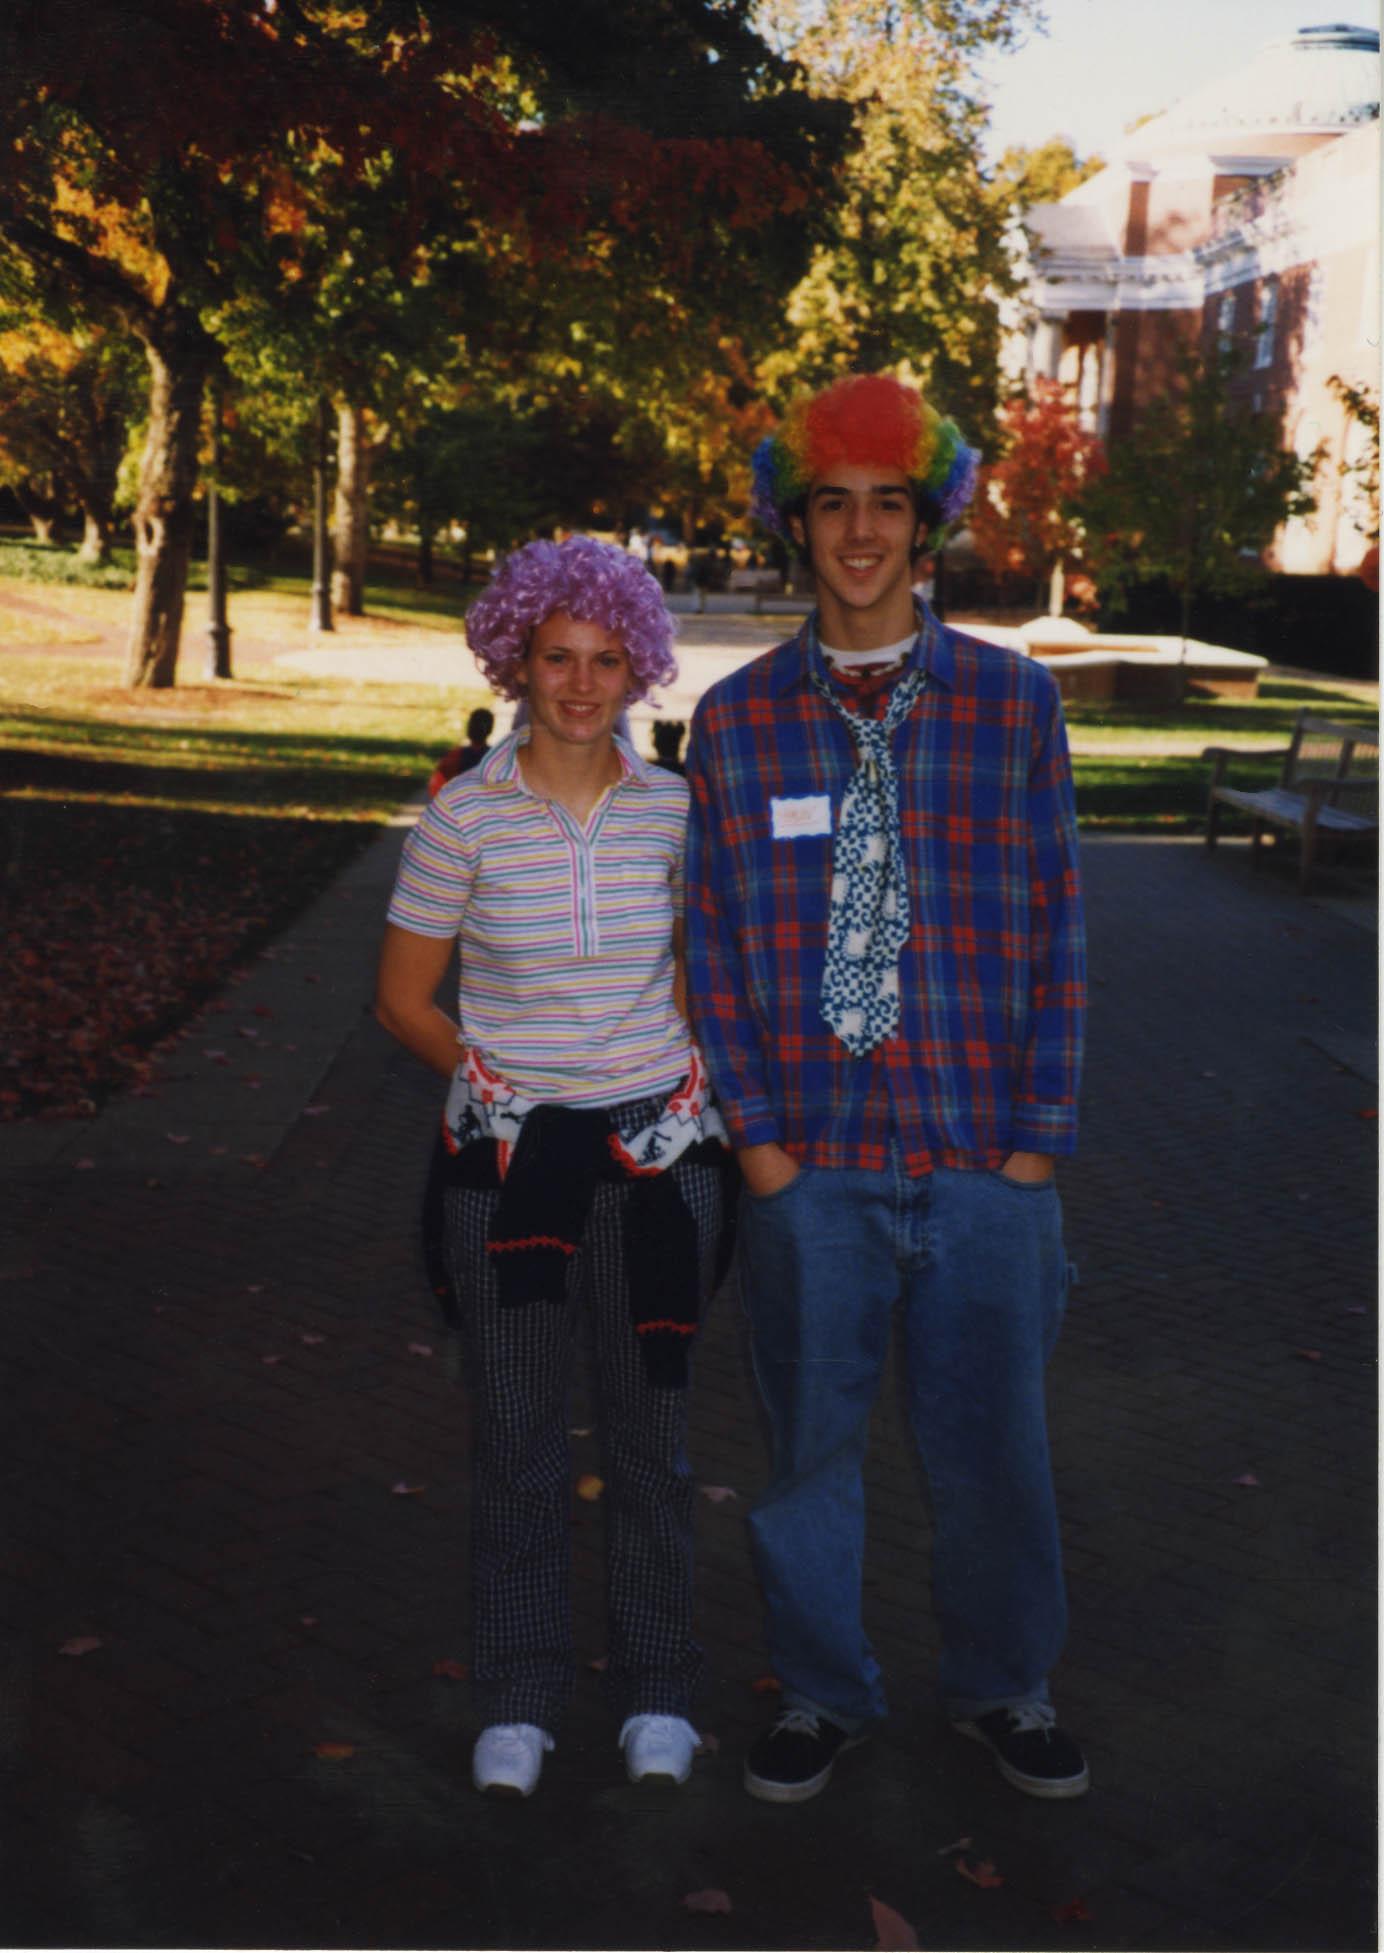 Mary Washington Students Participating in COAR's Halloween Festivities, 1998